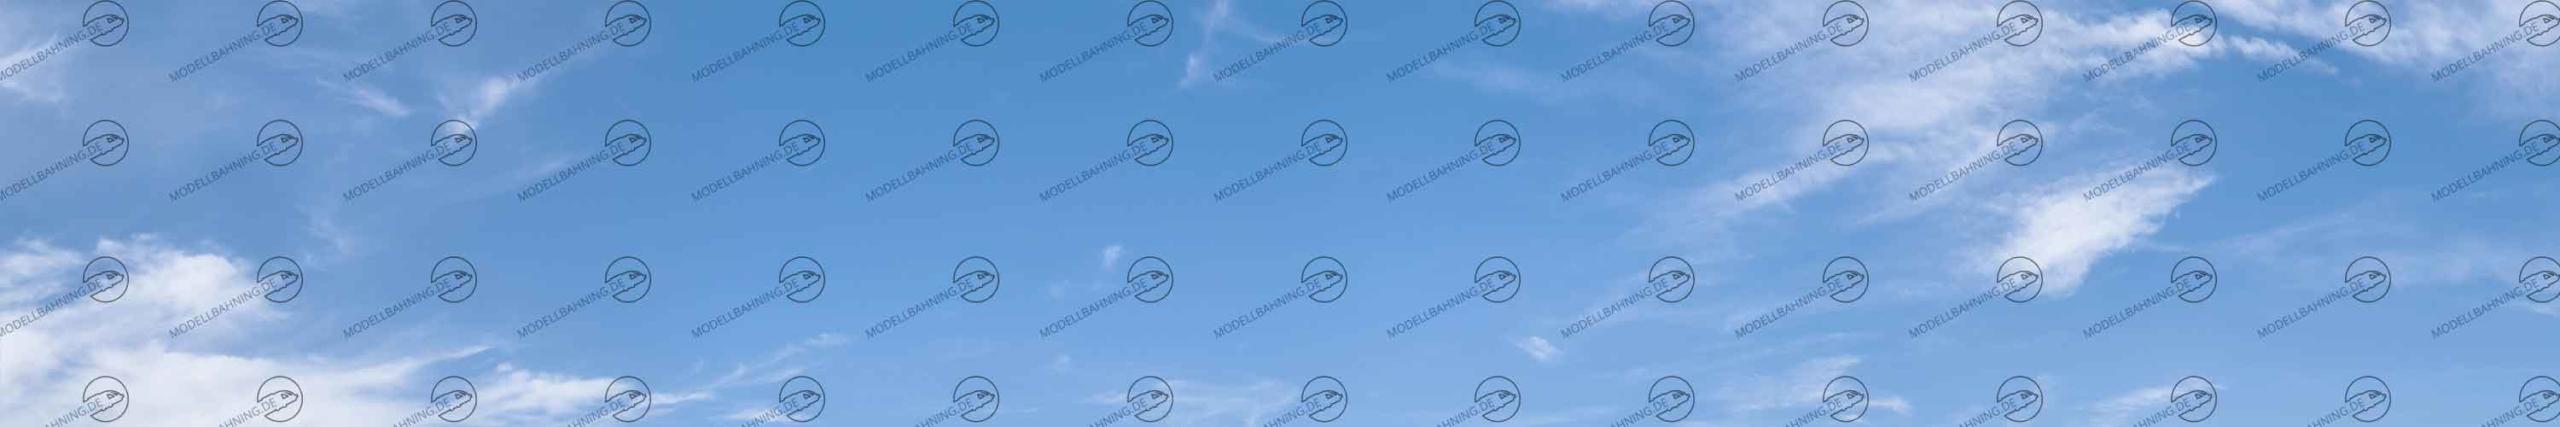 Endloser Himmel Teil 1 – Modellbahn Hintergrund 300cm x 50 cm 1